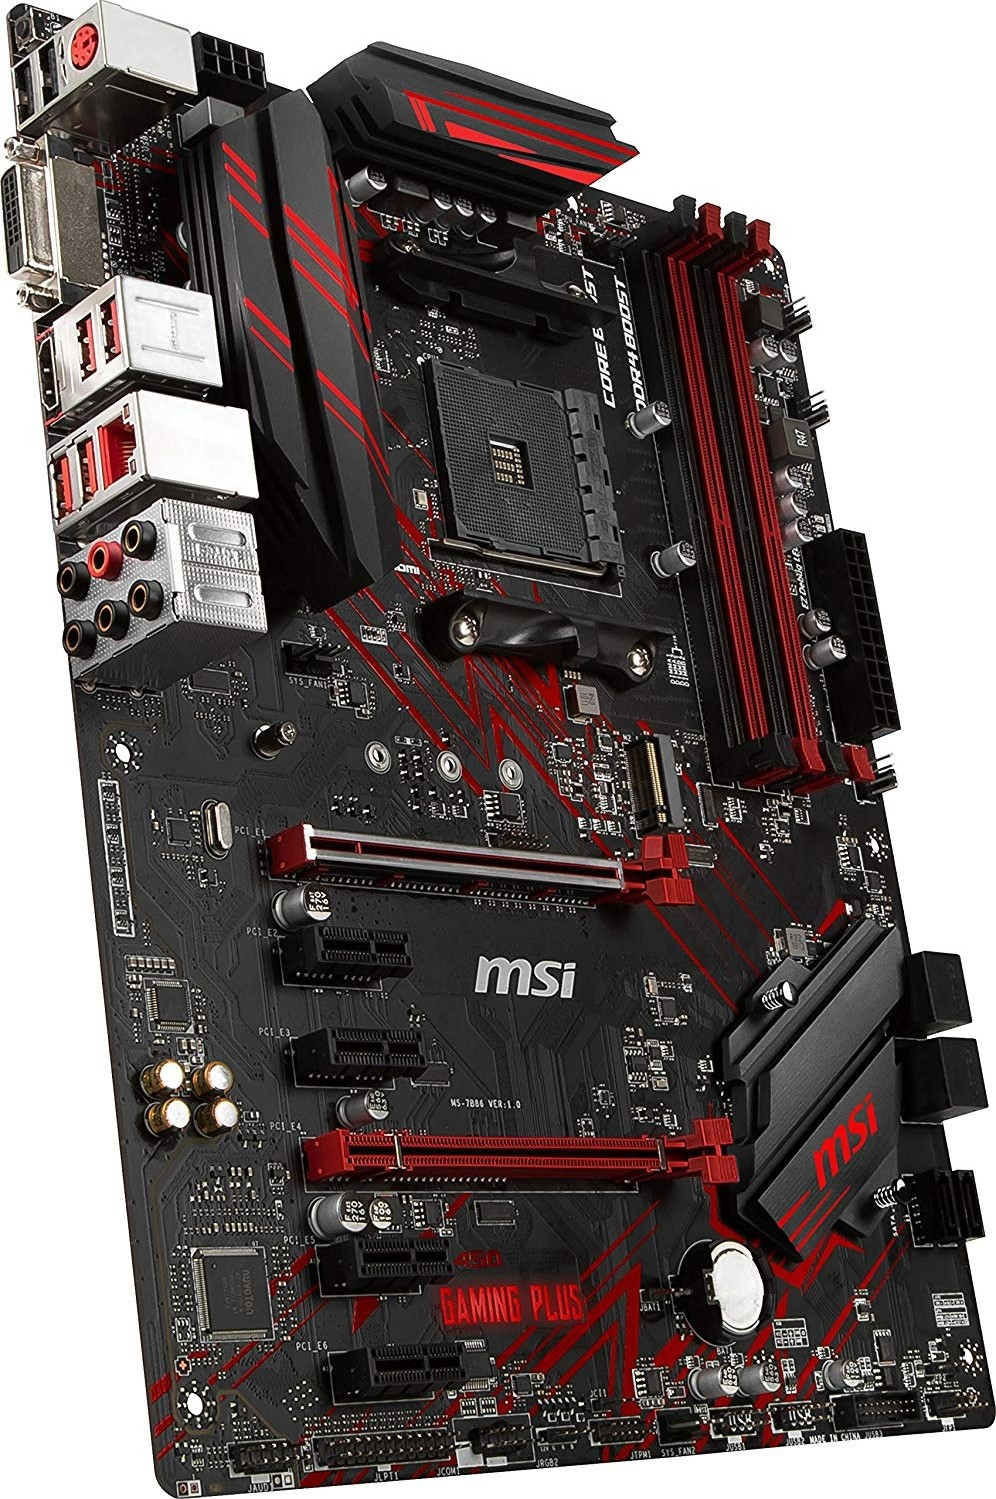 MSI B450 Gaming Plus AM4 AMD B450 Ryzen (91st 2nd Gen) DDR4 PCIe 3 0 X16  SATA 6Gb/s ATX AMD Motherboard | 911-7B86-010 / 911-7B86-002